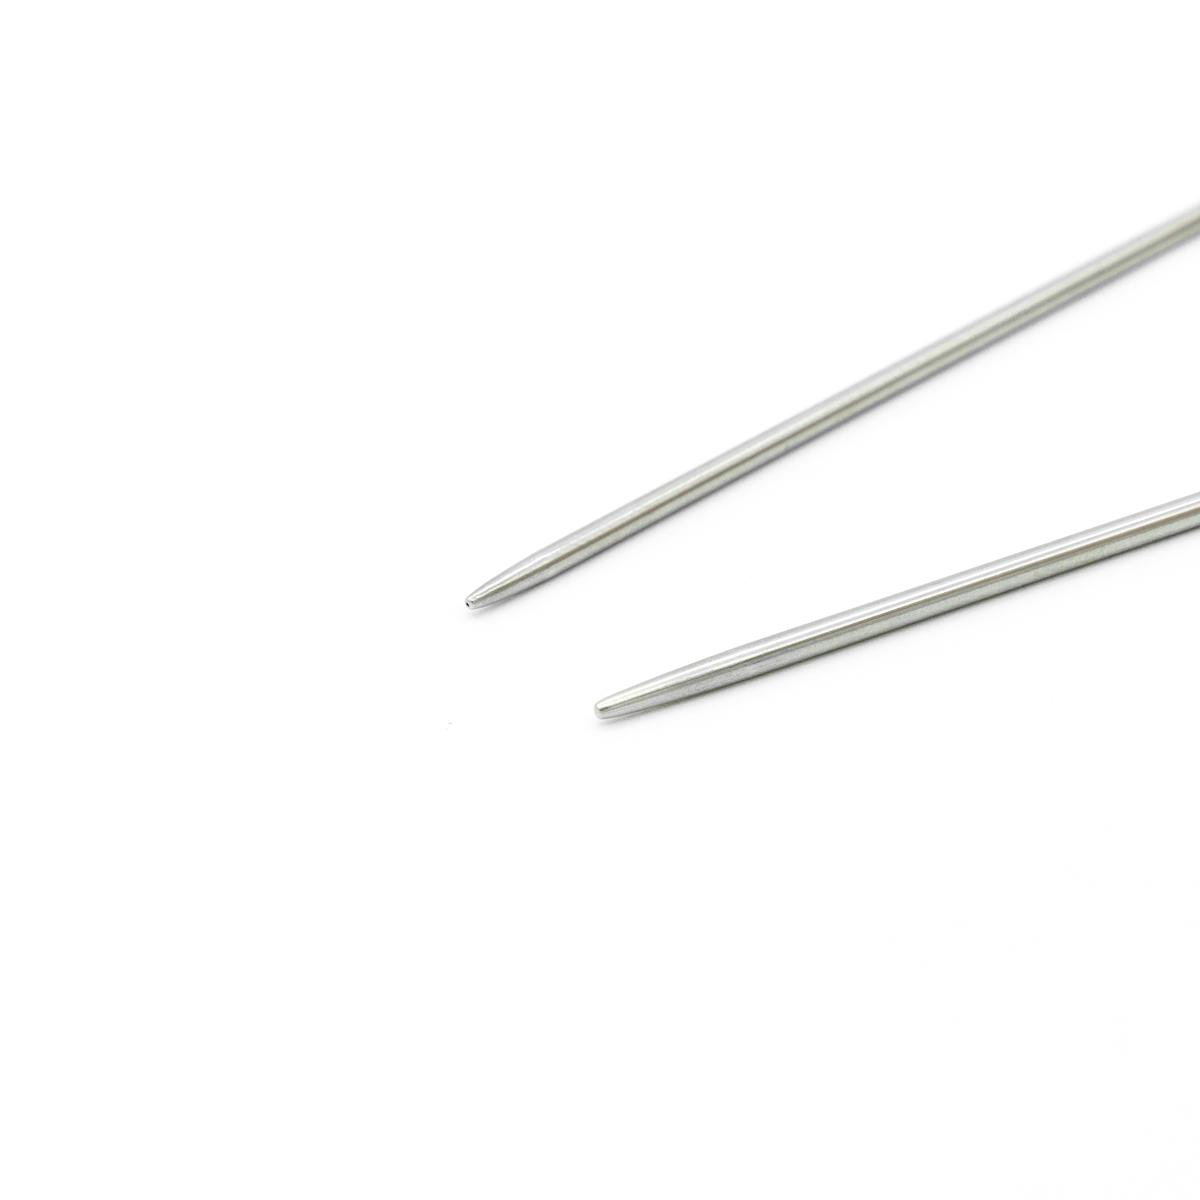 Спицы круговые металл 941120, 100 см, 2,0 мм, Hobby&Pro